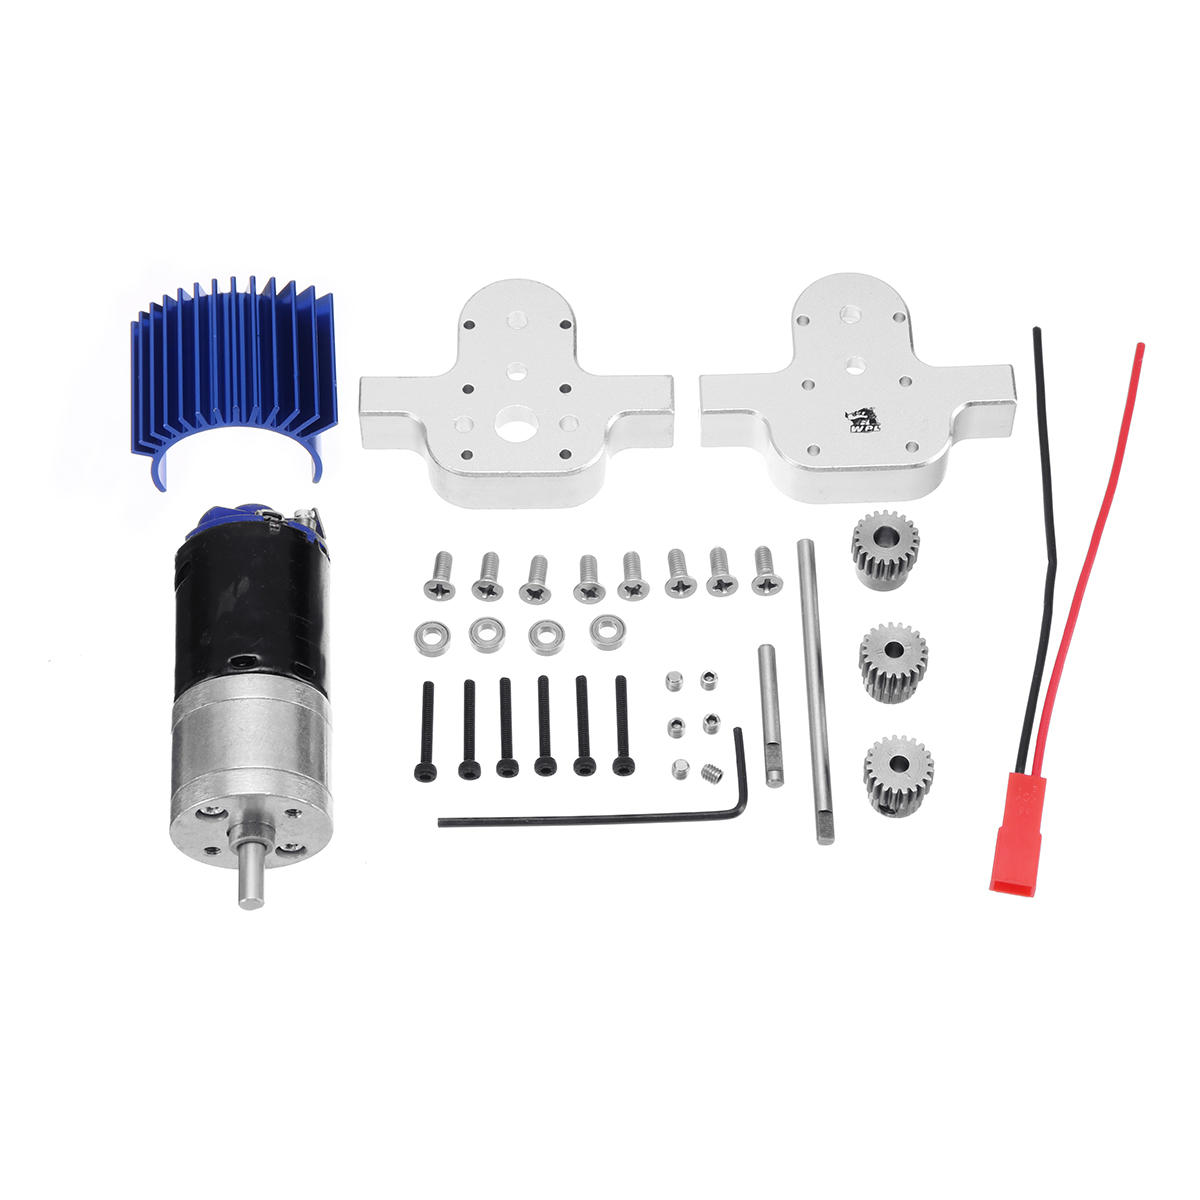 Metal Transfer Gearbox 370 Motor For WPL B-24 B16 B36 C24 1/16 4WD 6WD RC Car Case Silver metal transfer case with 370 motor